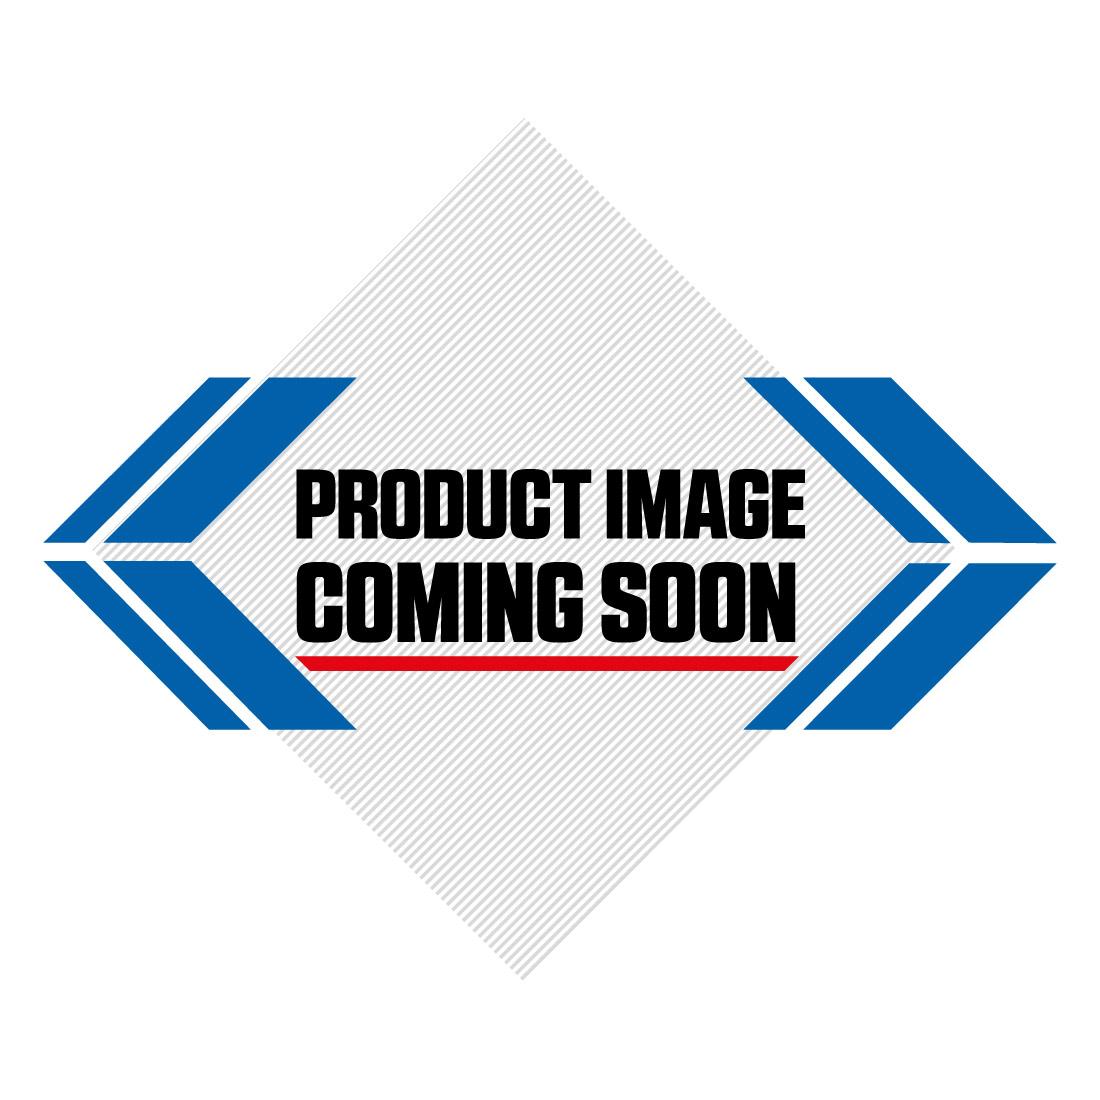 Silkolene Comp 4 10w-40 XP Ester Based Semi Synthetic Bike Engine Oil - 4 Cube Image-3>